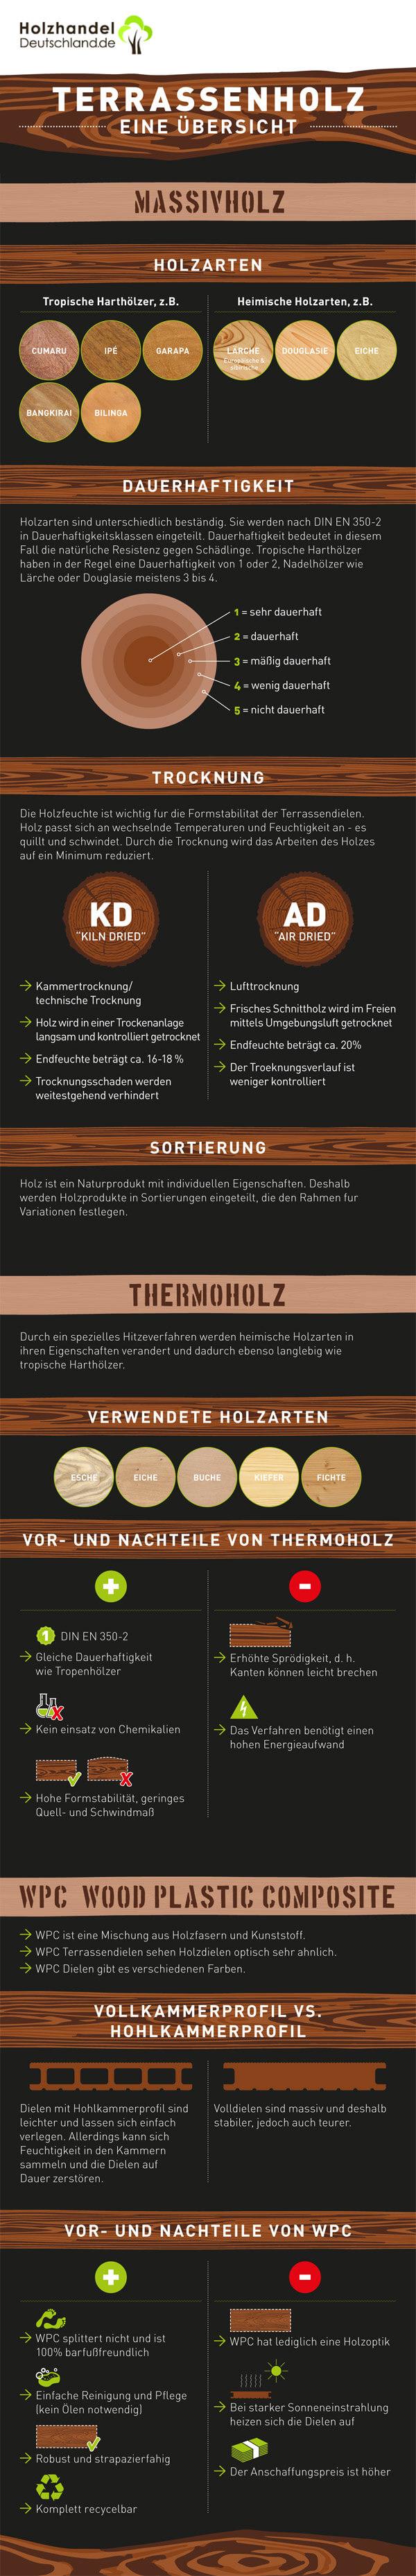 Übersicht Terrassenhölzer (Infografik)